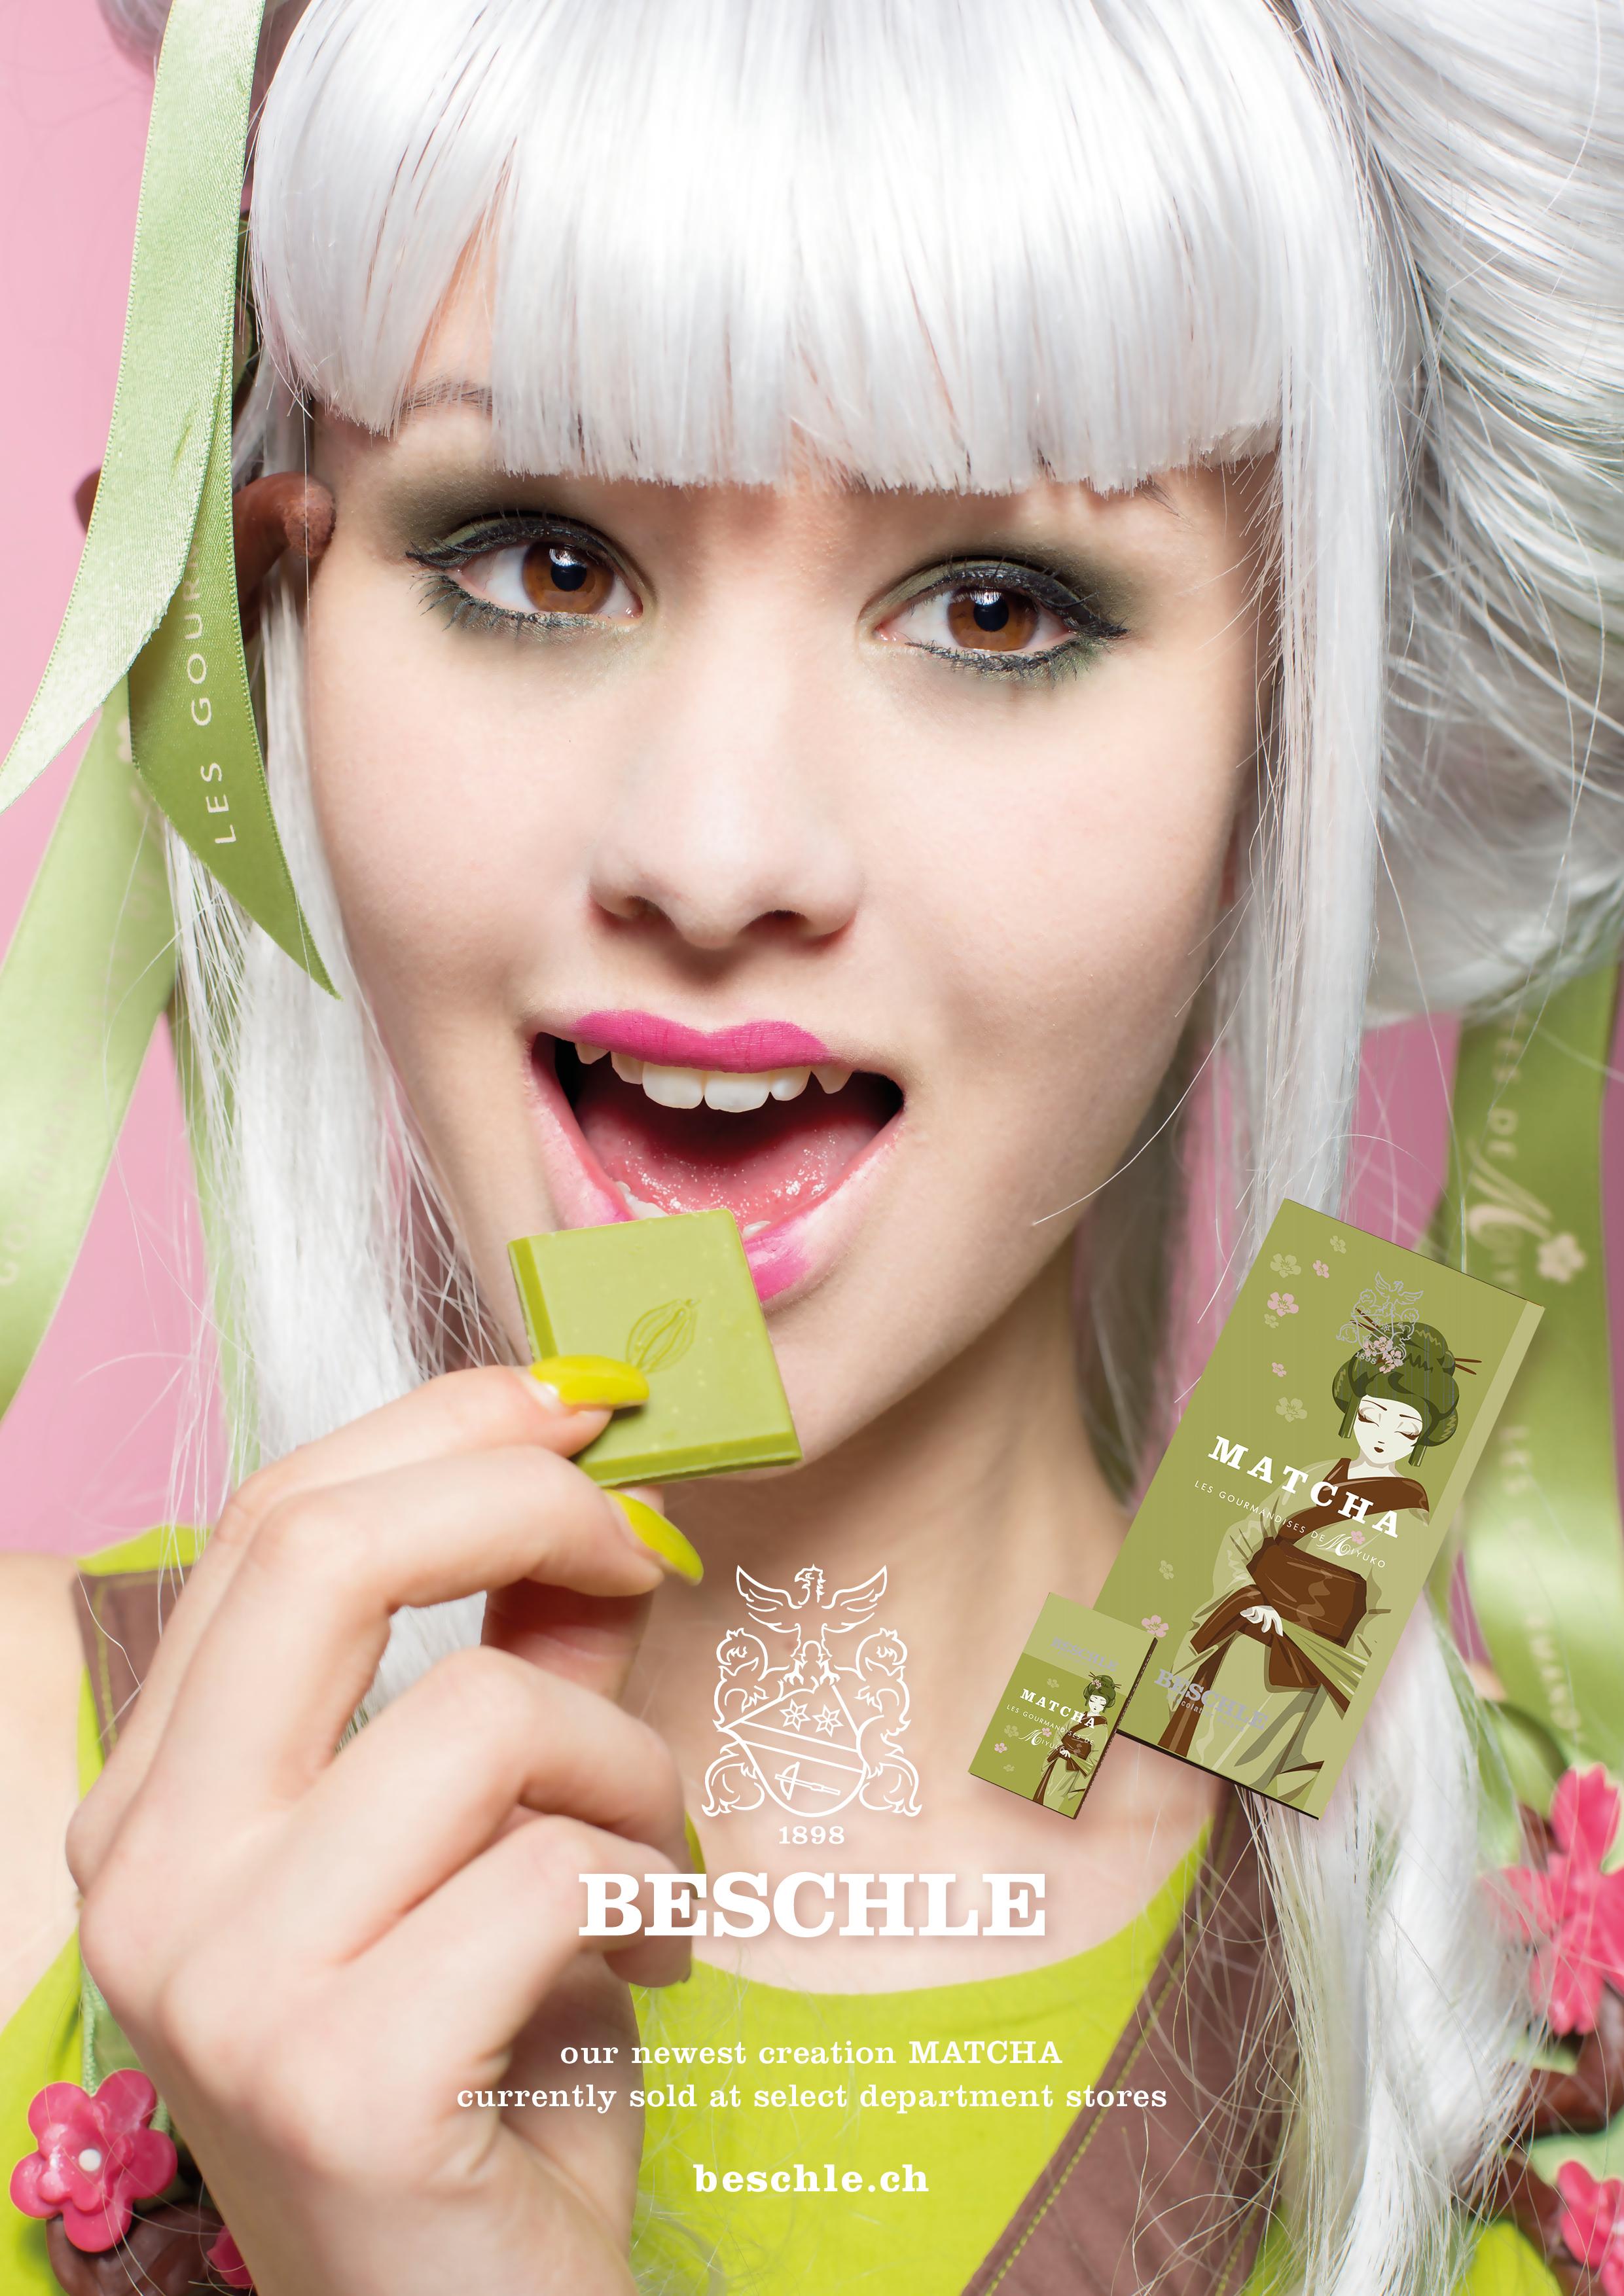 Matcha Schoko-Girl